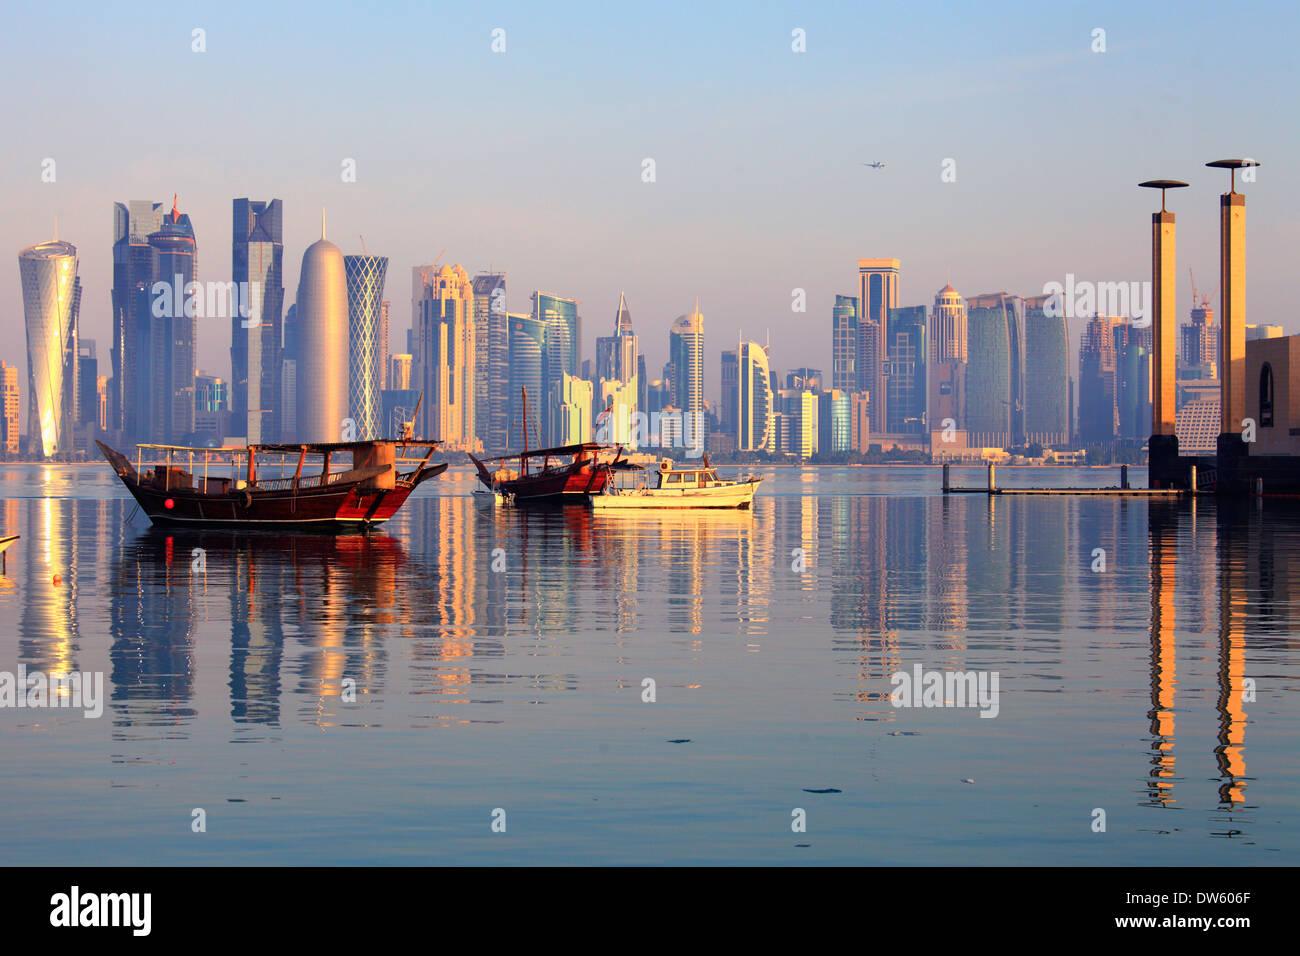 Qatar, Doha, West Bay, business district, skyline, - Stock Image